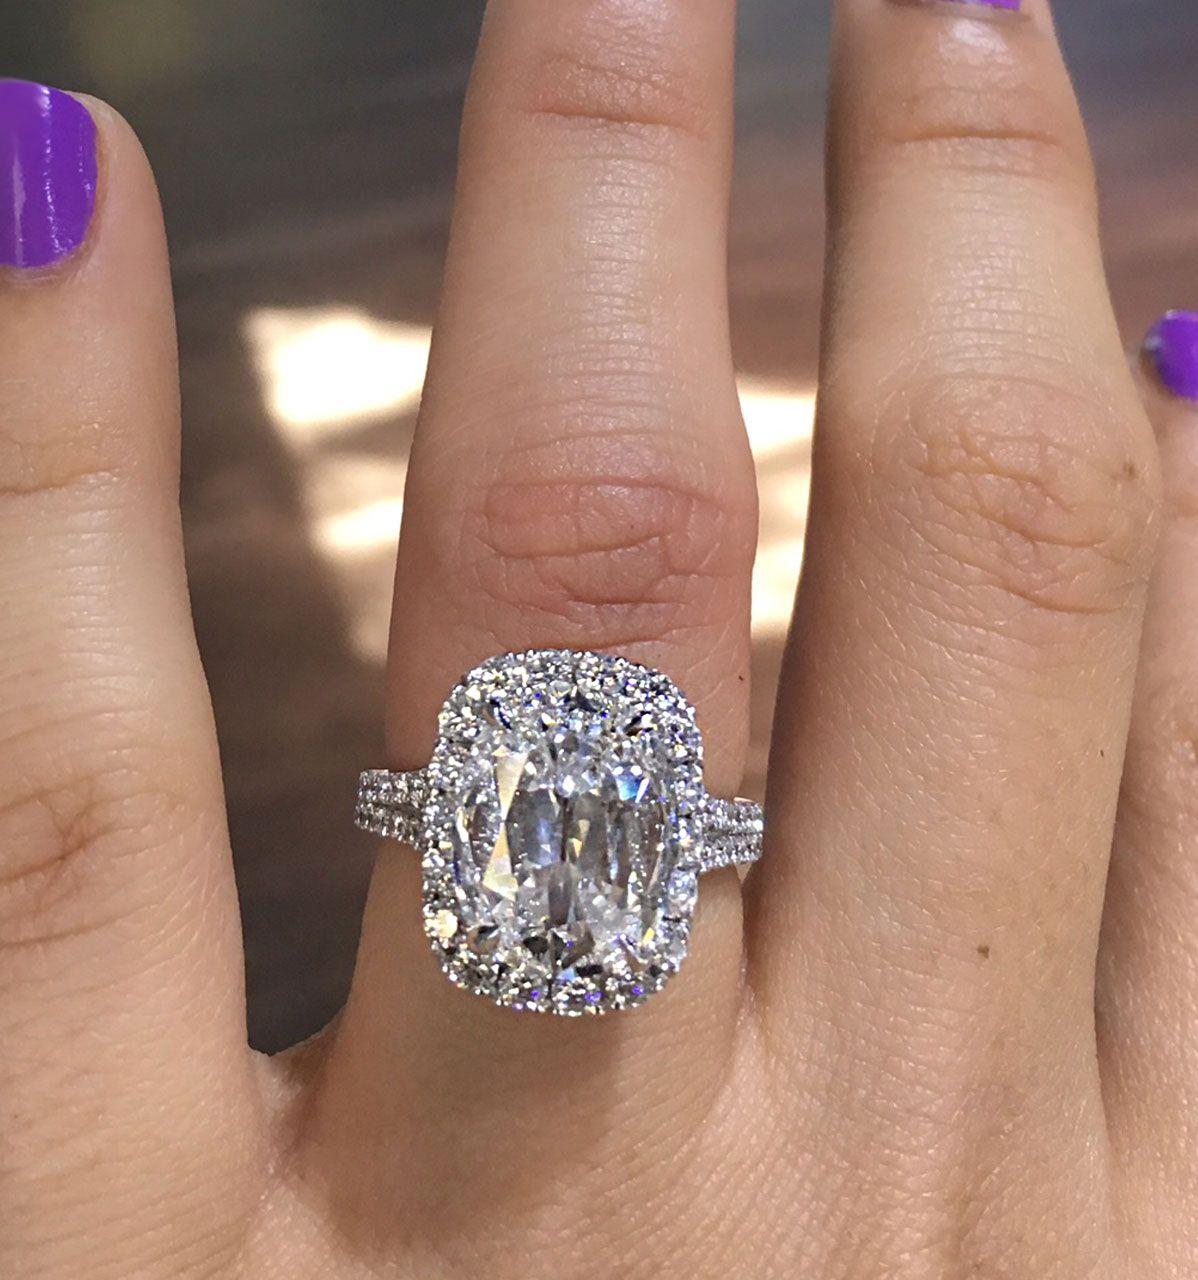 Henri Daussi Engagement Rings 4.26ct Diamond Cushion Cut